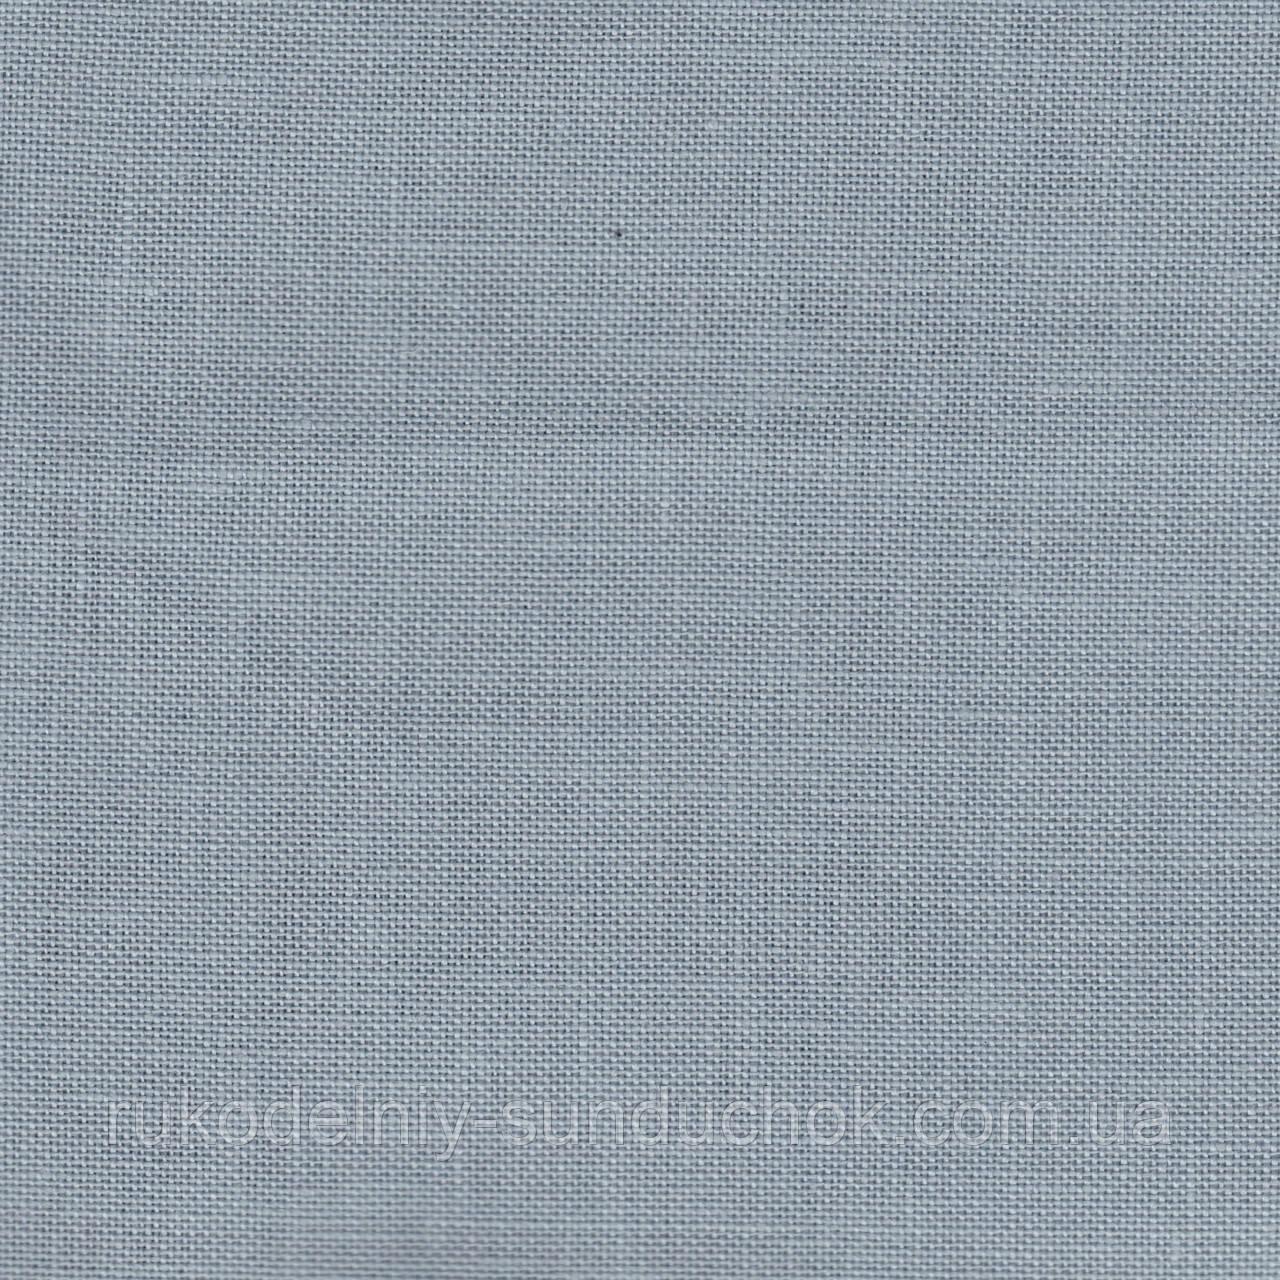 Ткань равномерного переплетения Zweigart Belfast 32 ct. 3609/778 Smokey Pearl (дымчатый жемчуг)